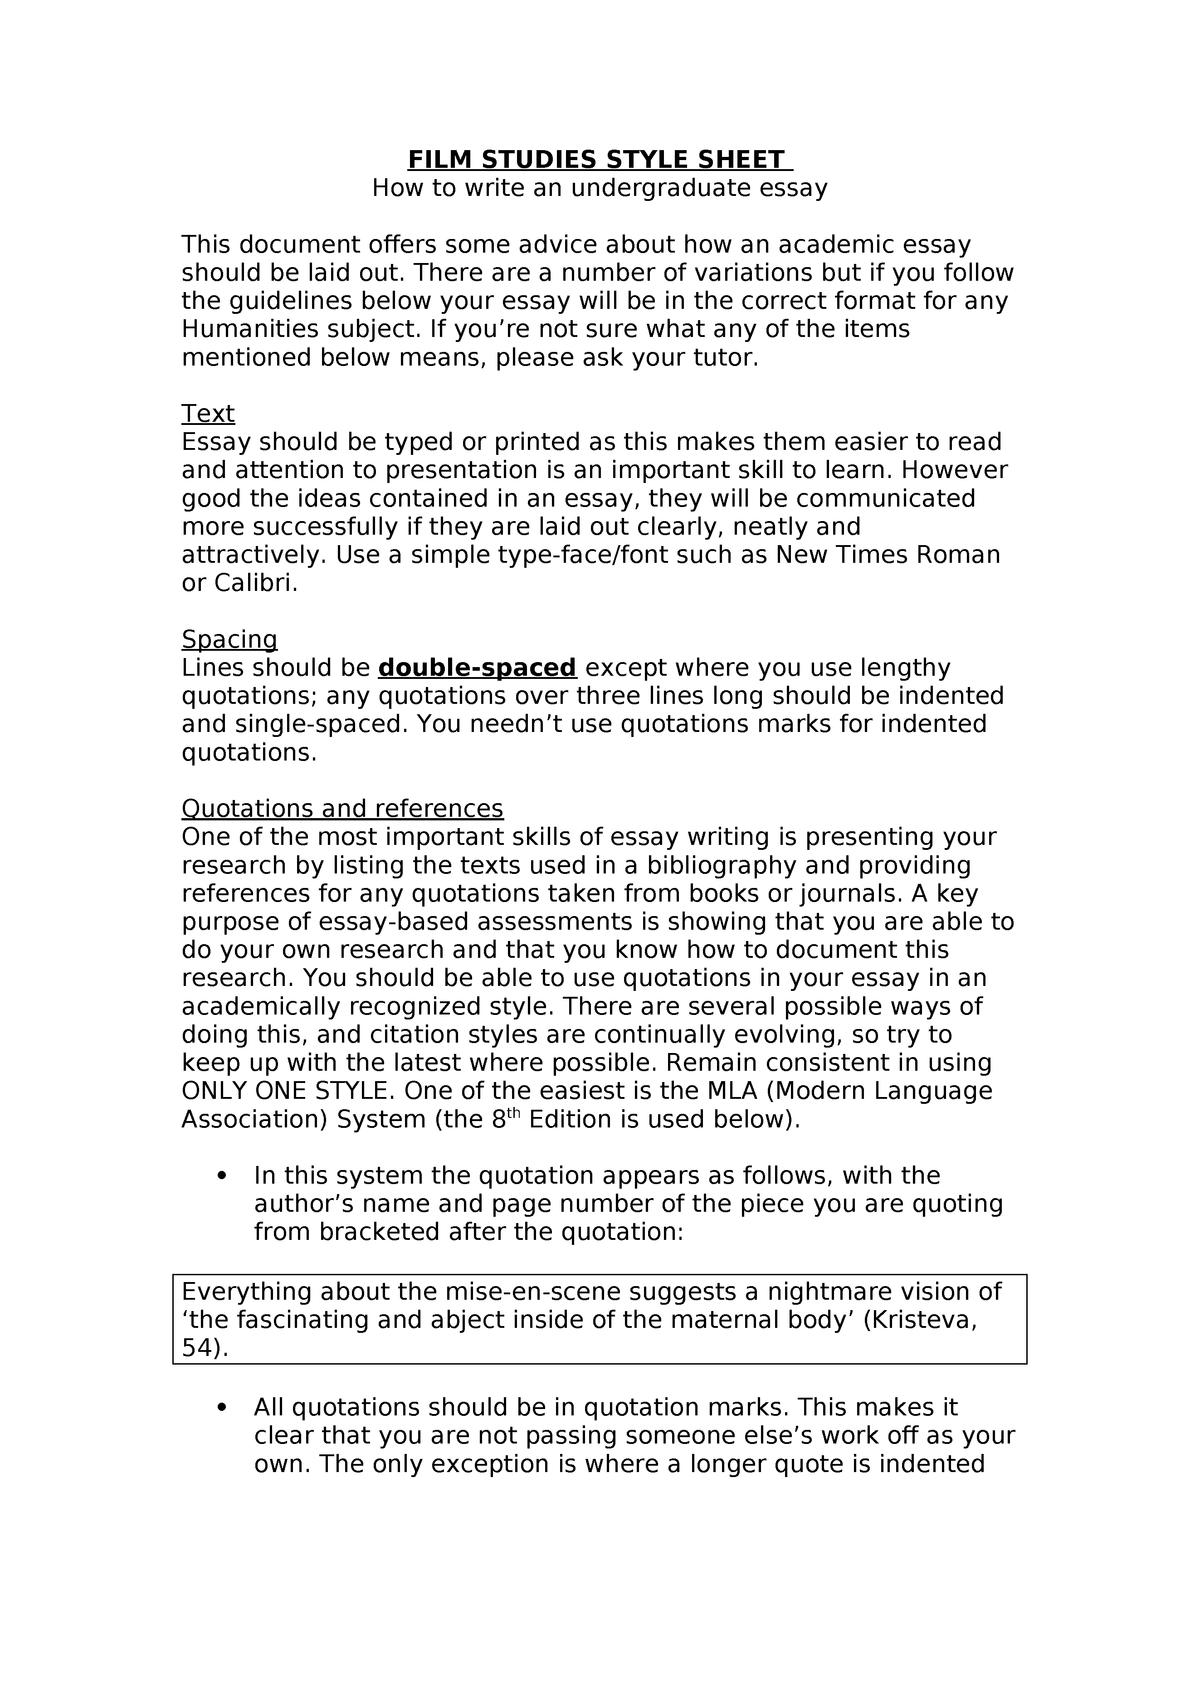 Film studies style sheet - EN2203/EN2113: Introduction to